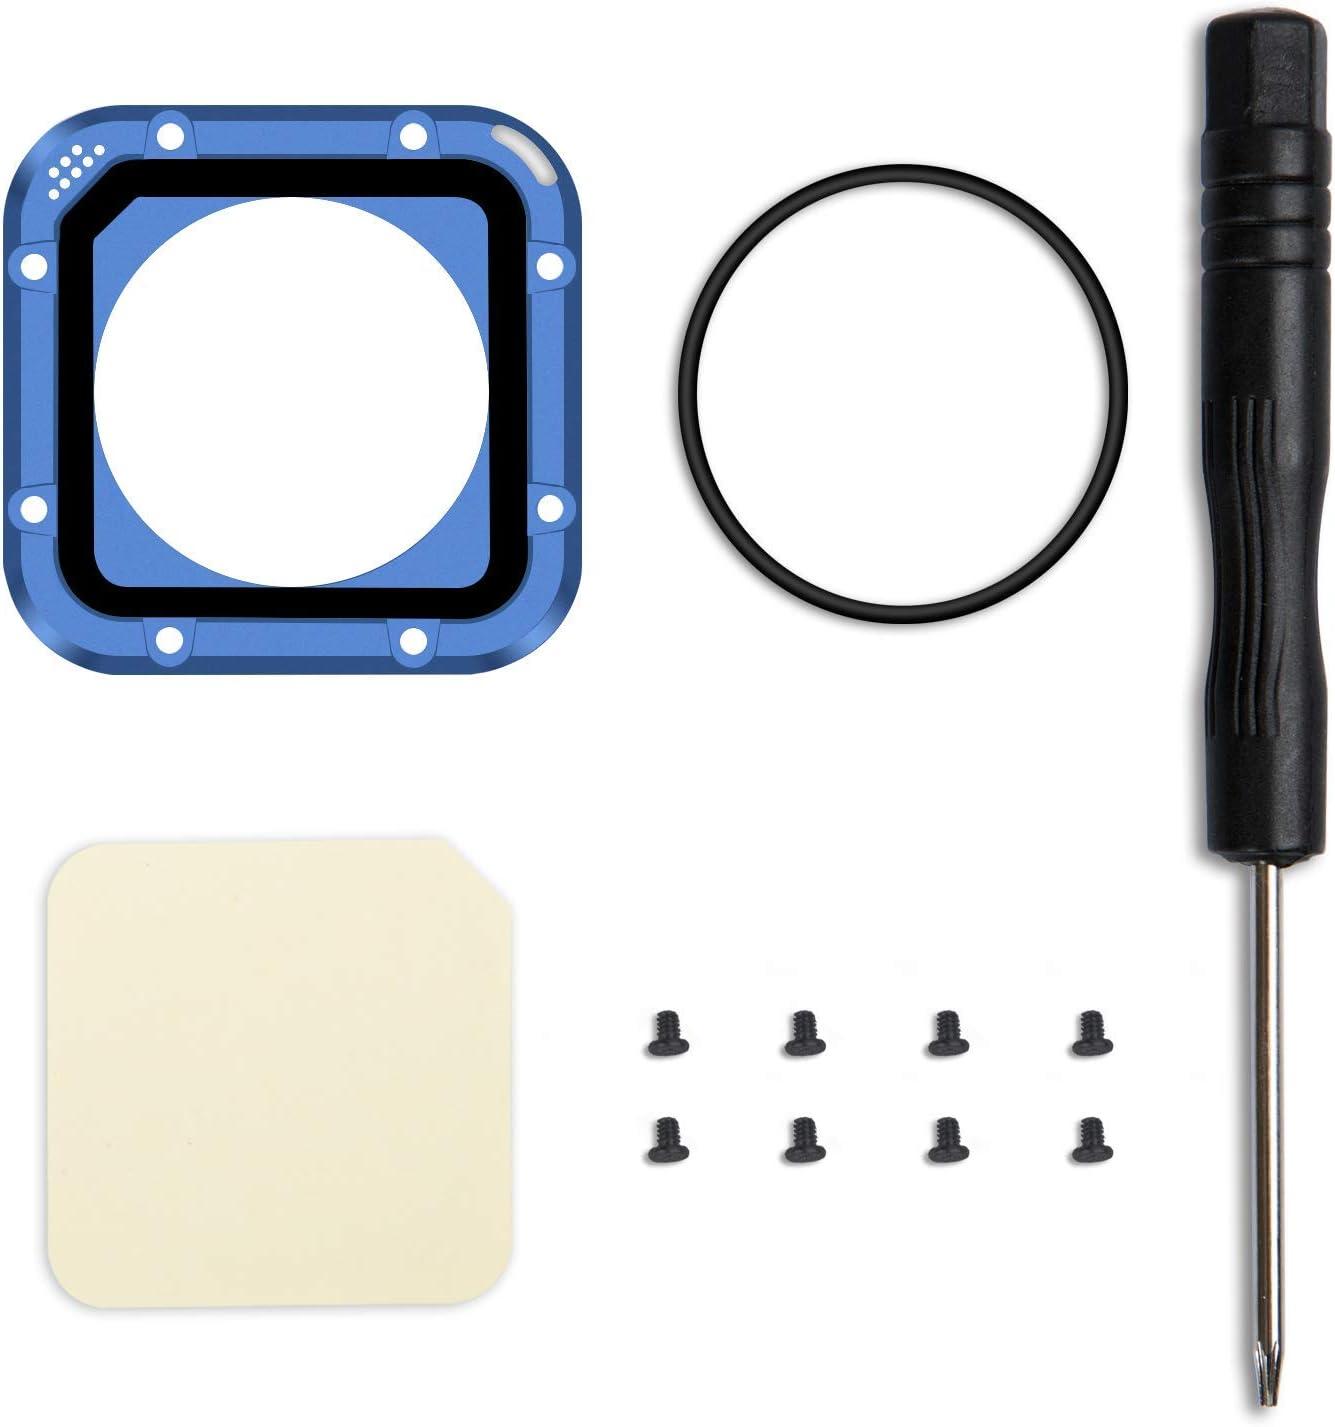 Electronics Digital Camera Accessories  2 Pack  GOHIGH Lens ...